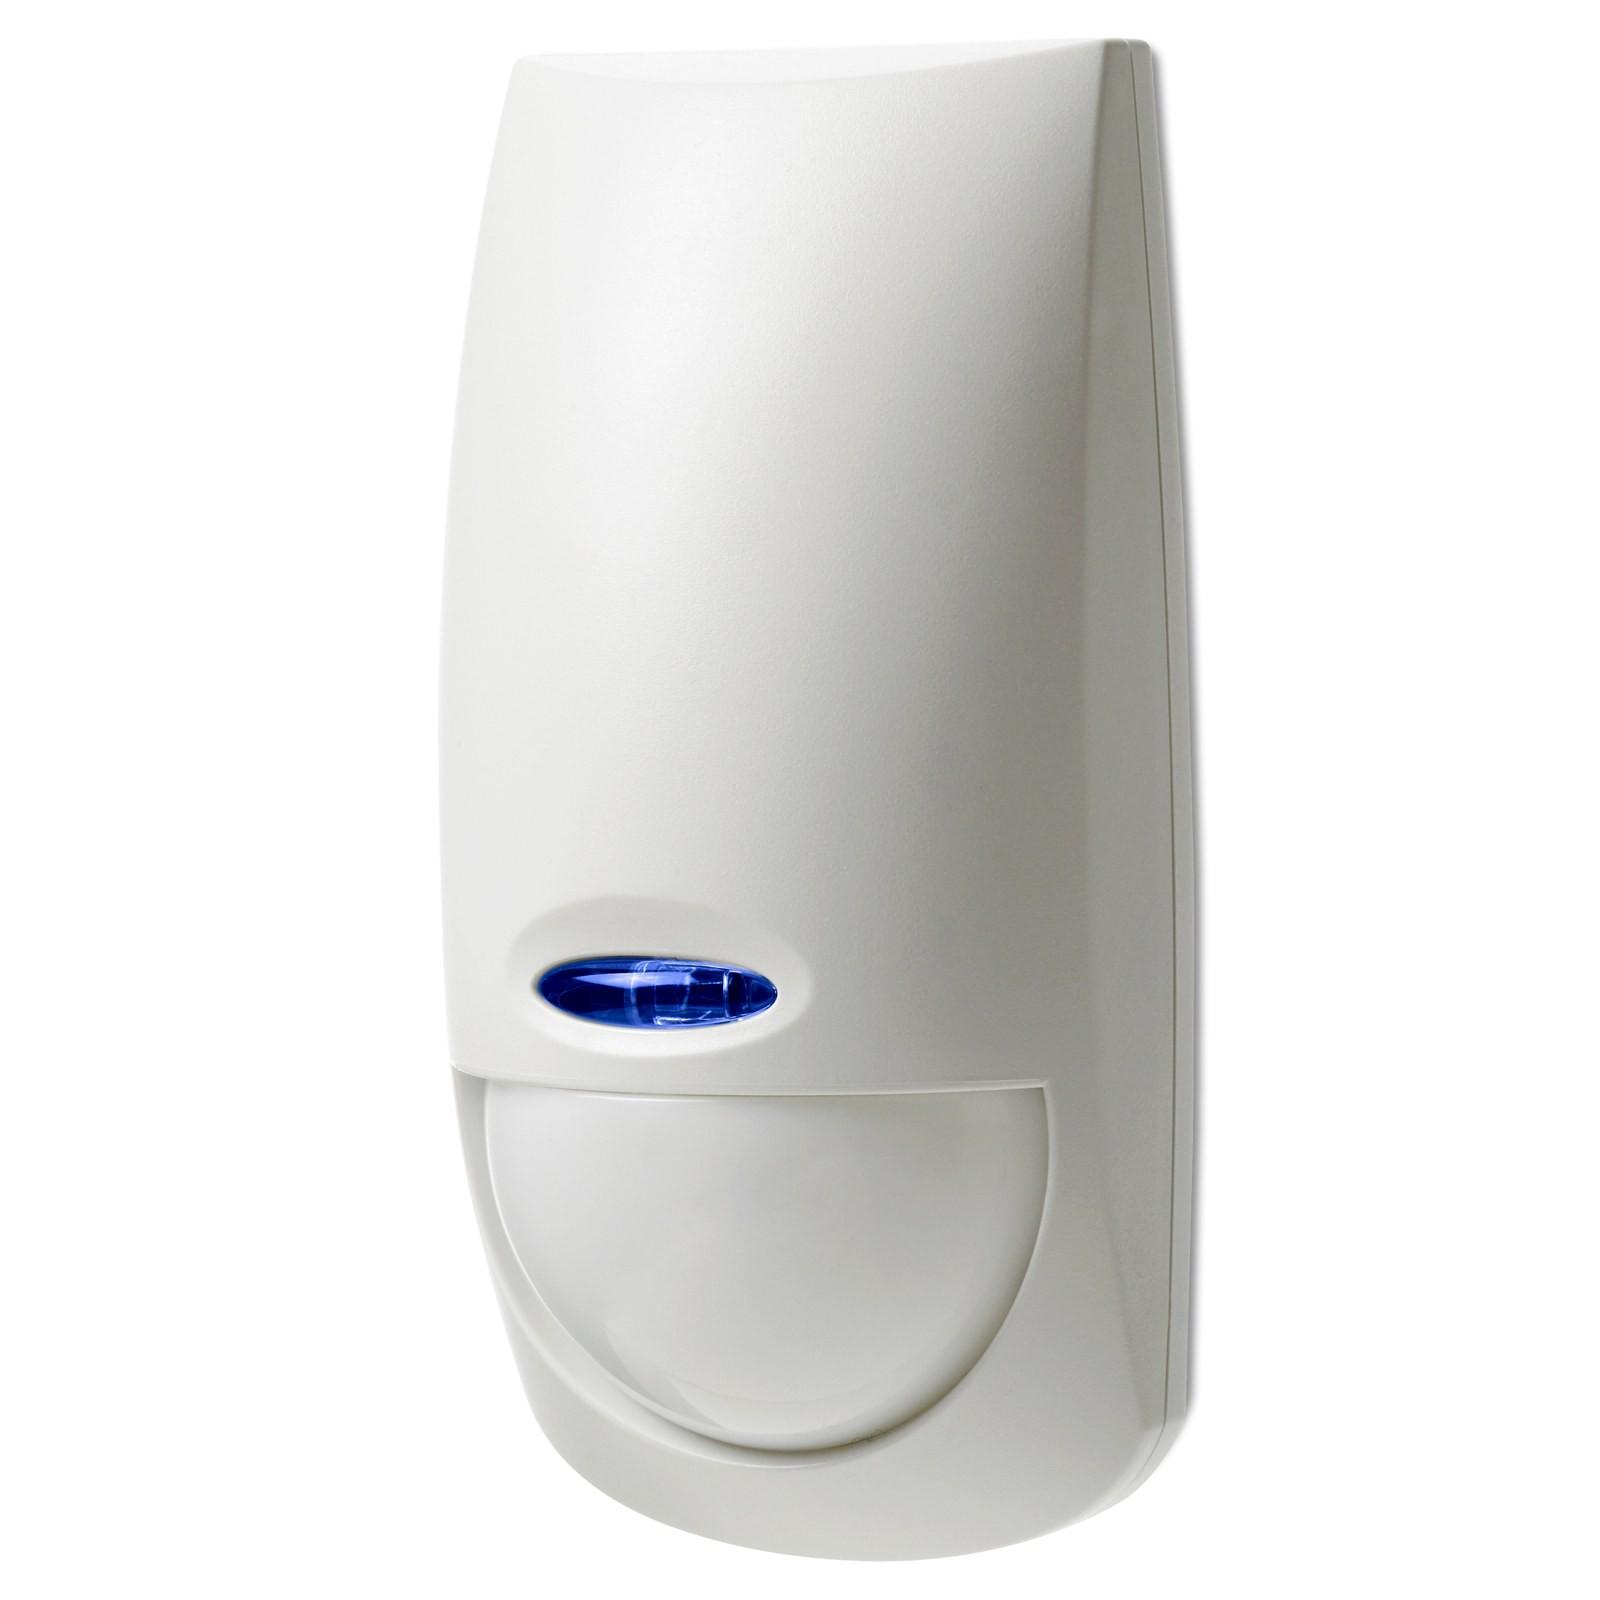 Sensore pir volumetrico movimento allarme doppia for Bentel kyo 320 prezzo